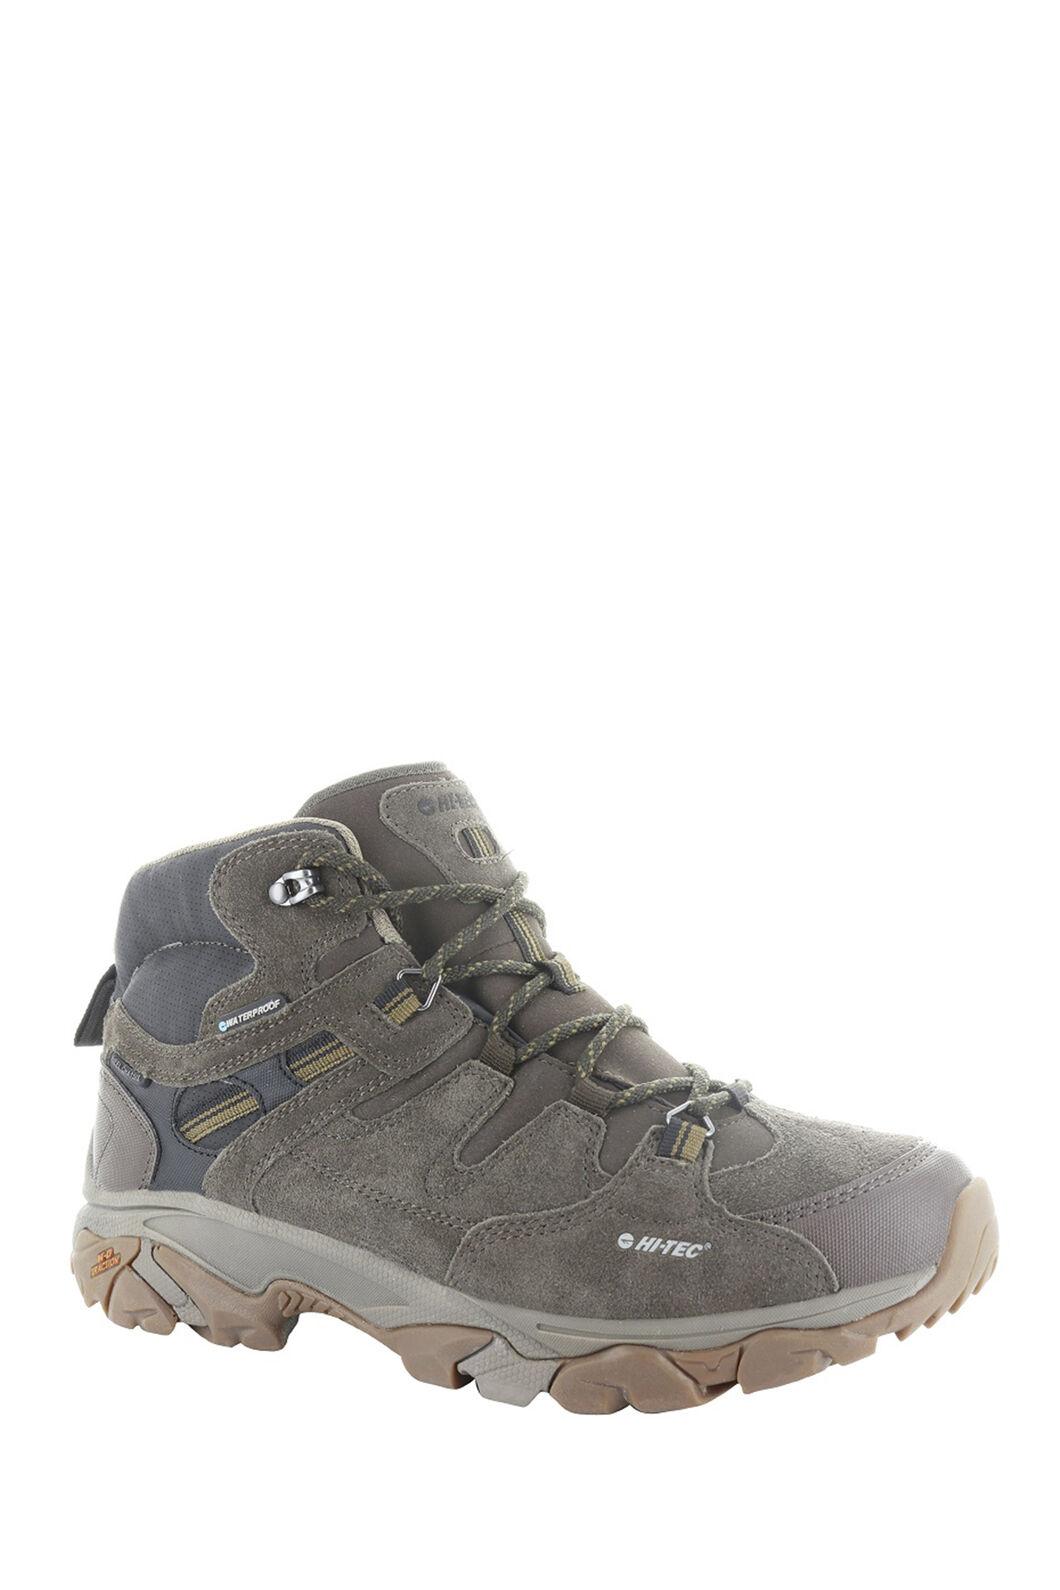 Hi-Tec Men's Ravus Adventure Hiking Boots, Chocolate/Tan, hi-res